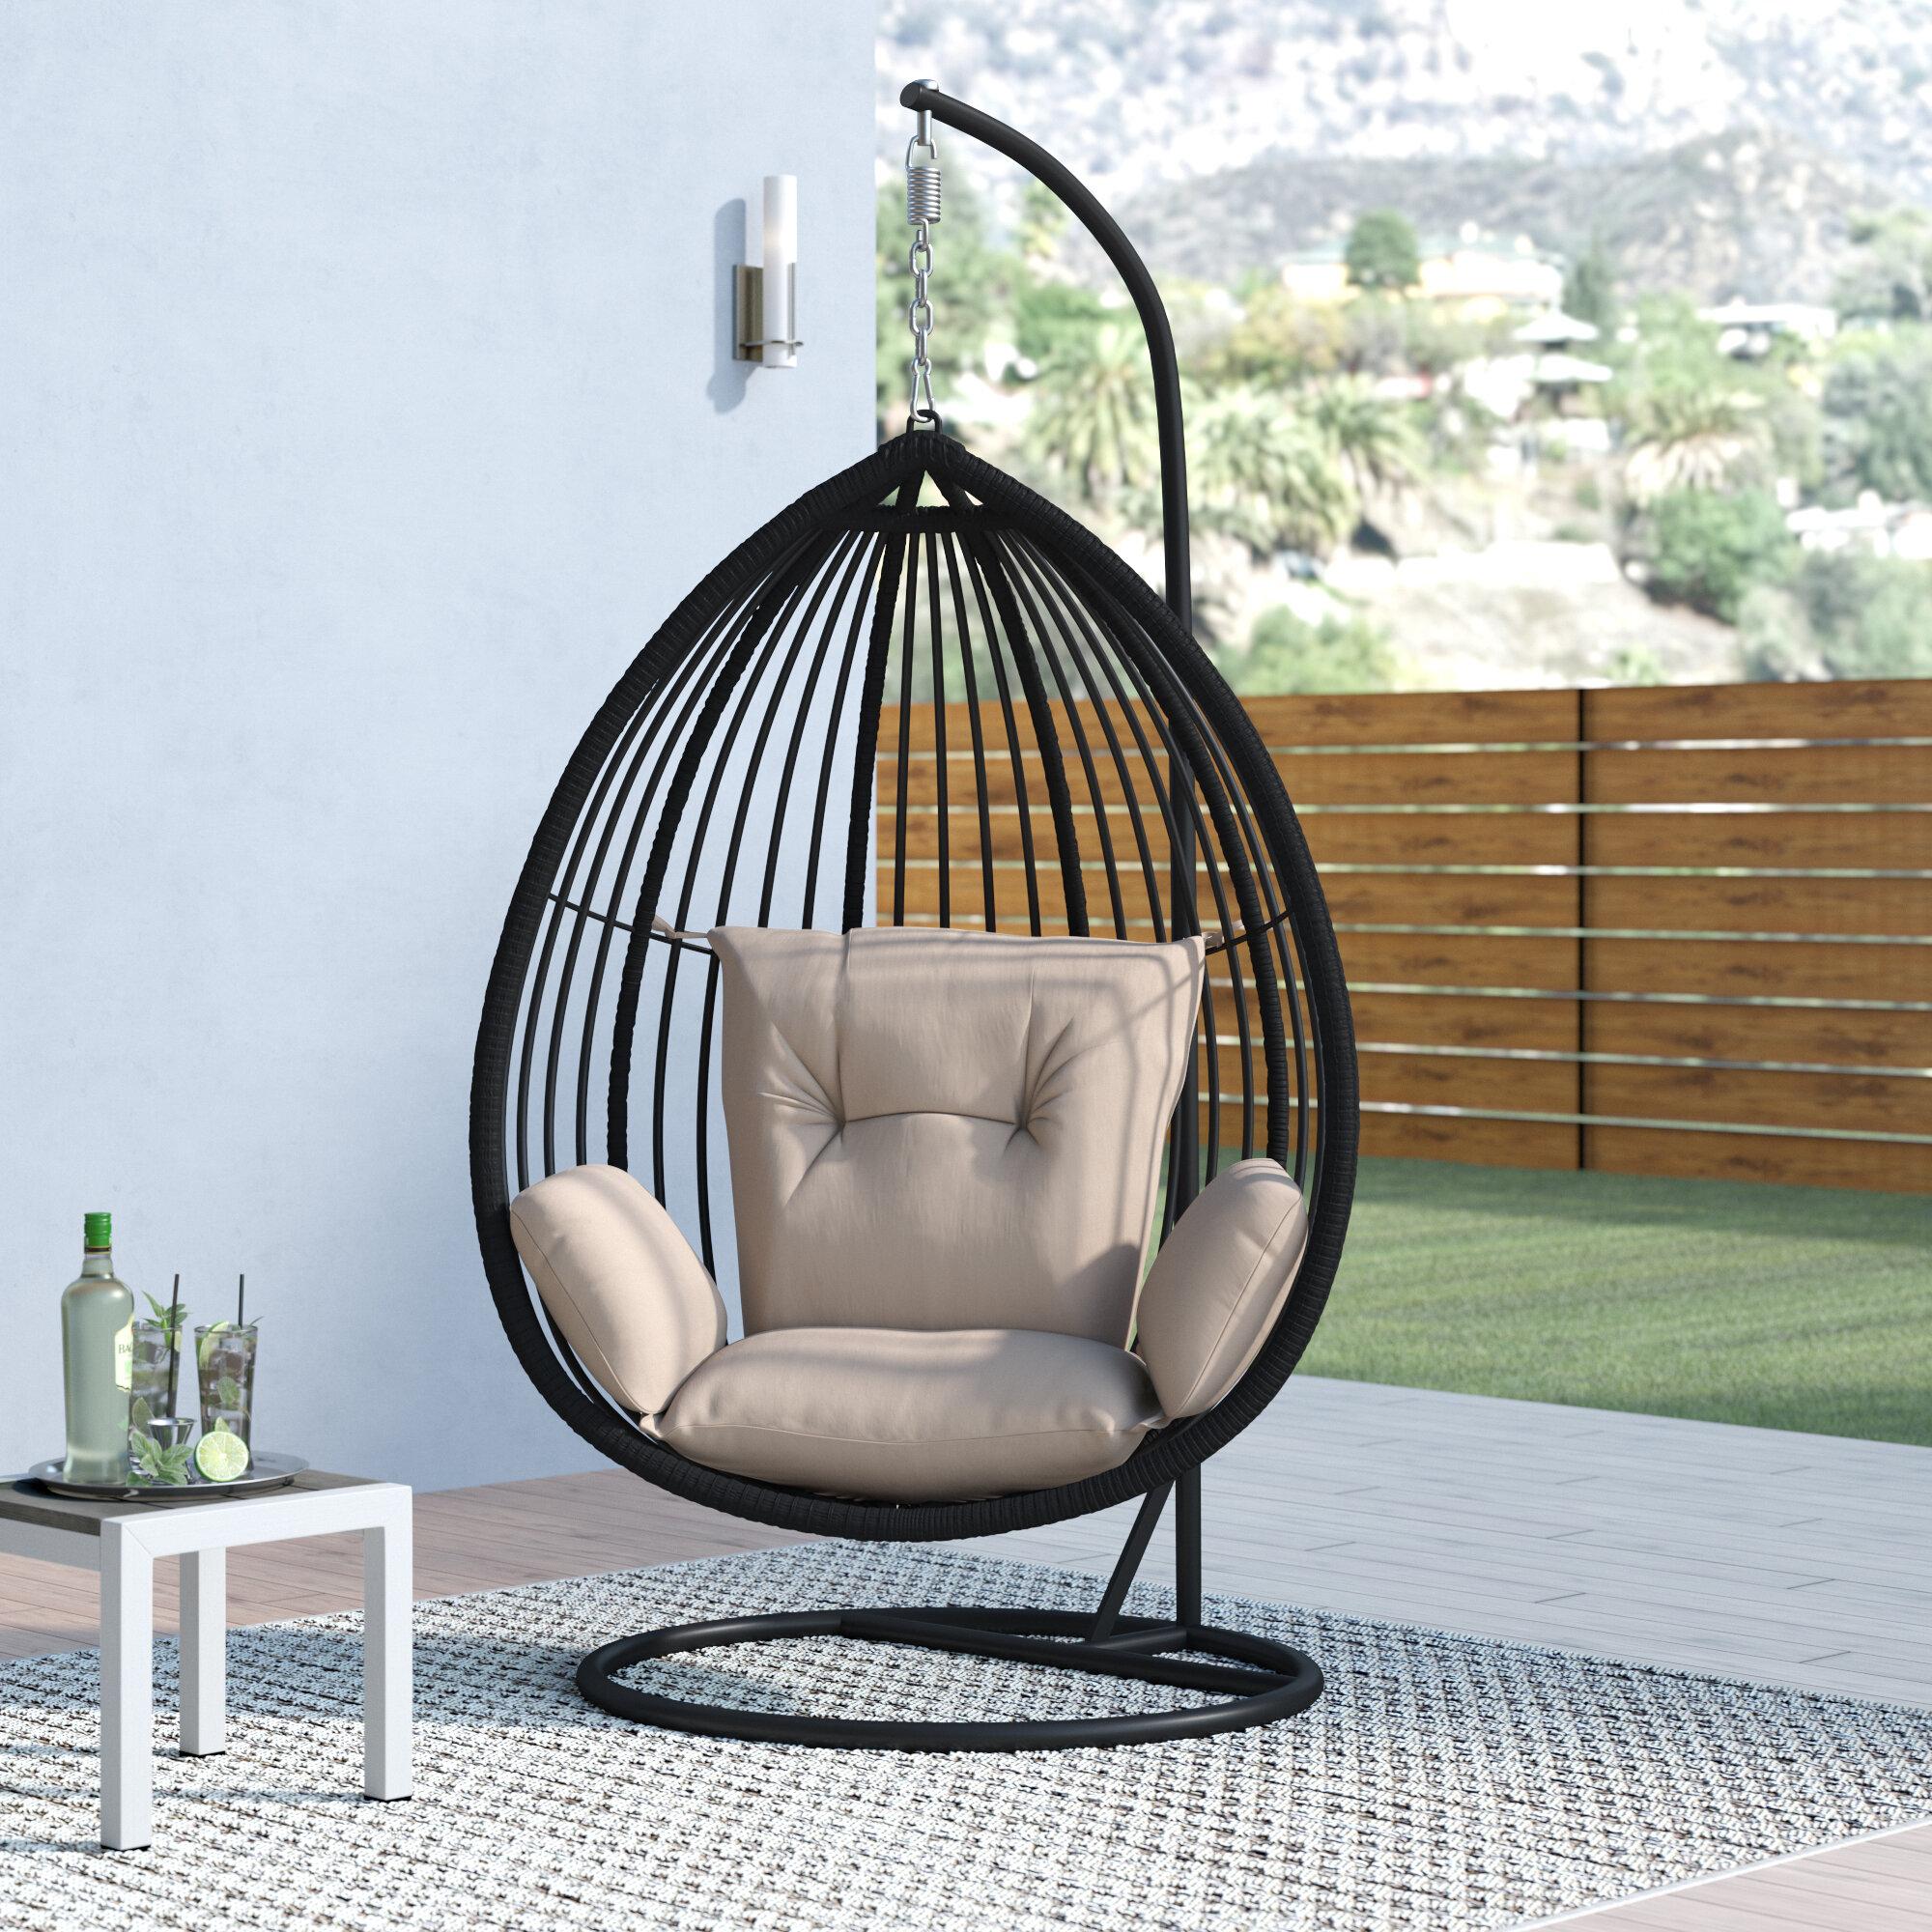 a175970de73 Orren Ellis Audra Swing Chair with Stand   Reviews